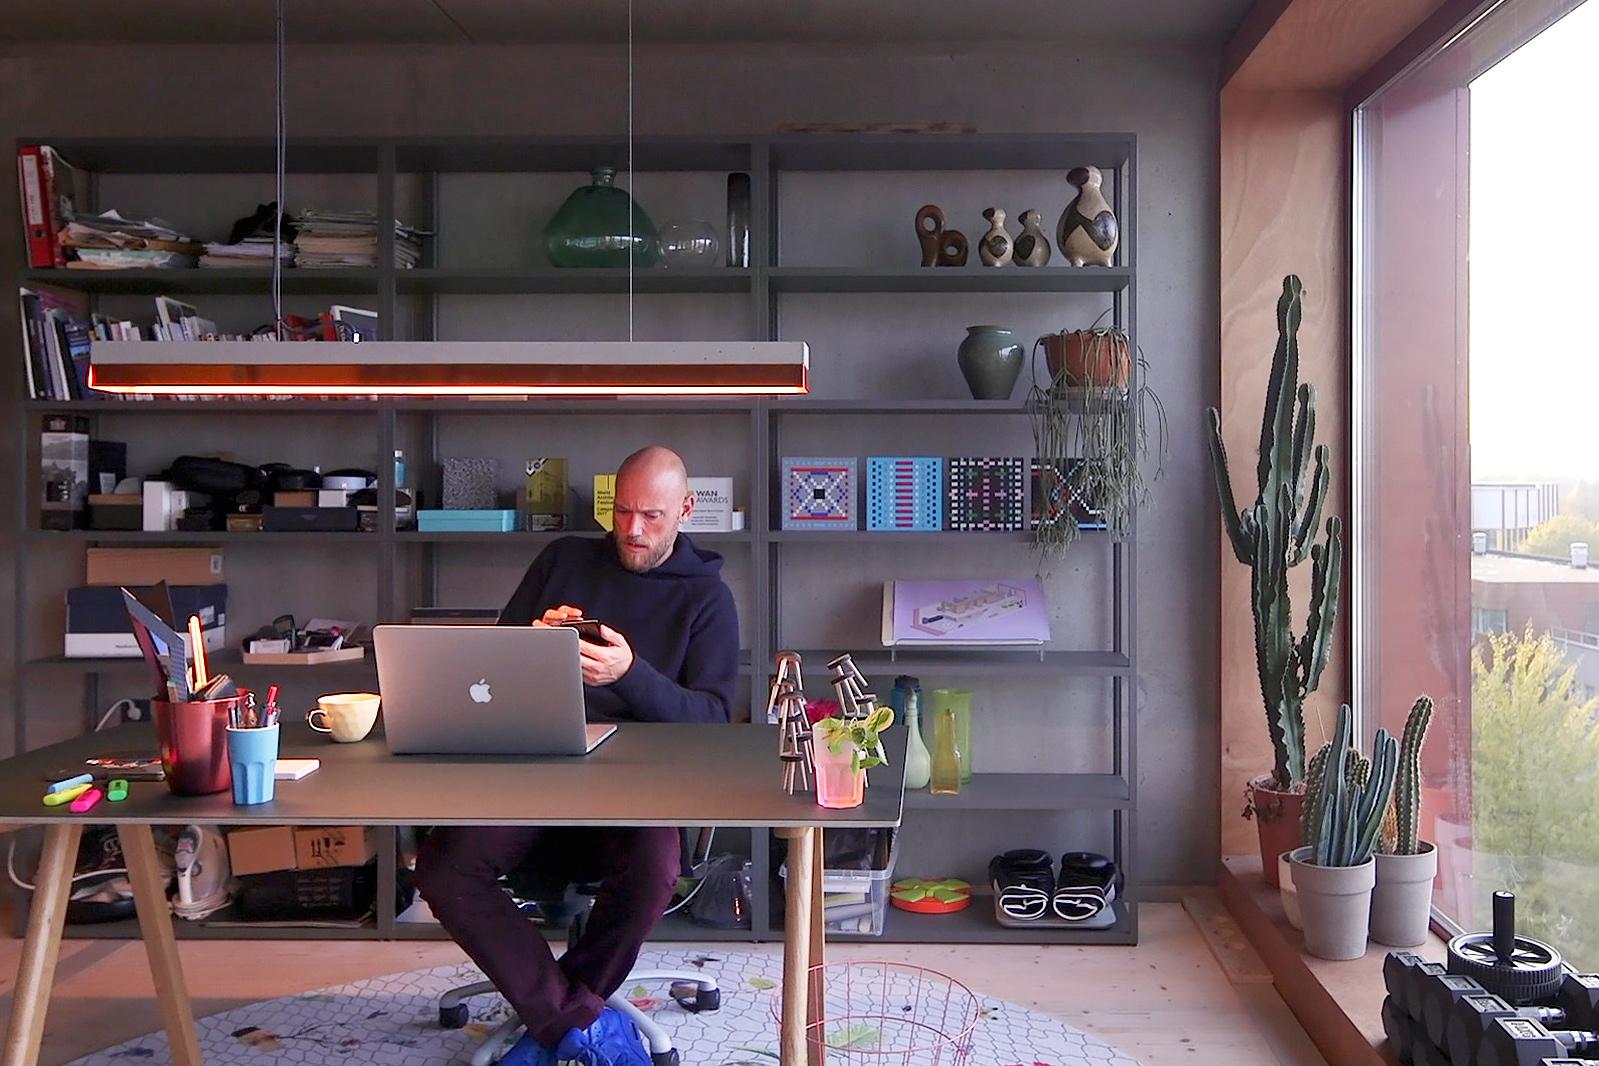 Architectuurvideo Superloft interieur Marc Koehler | Architectuur video